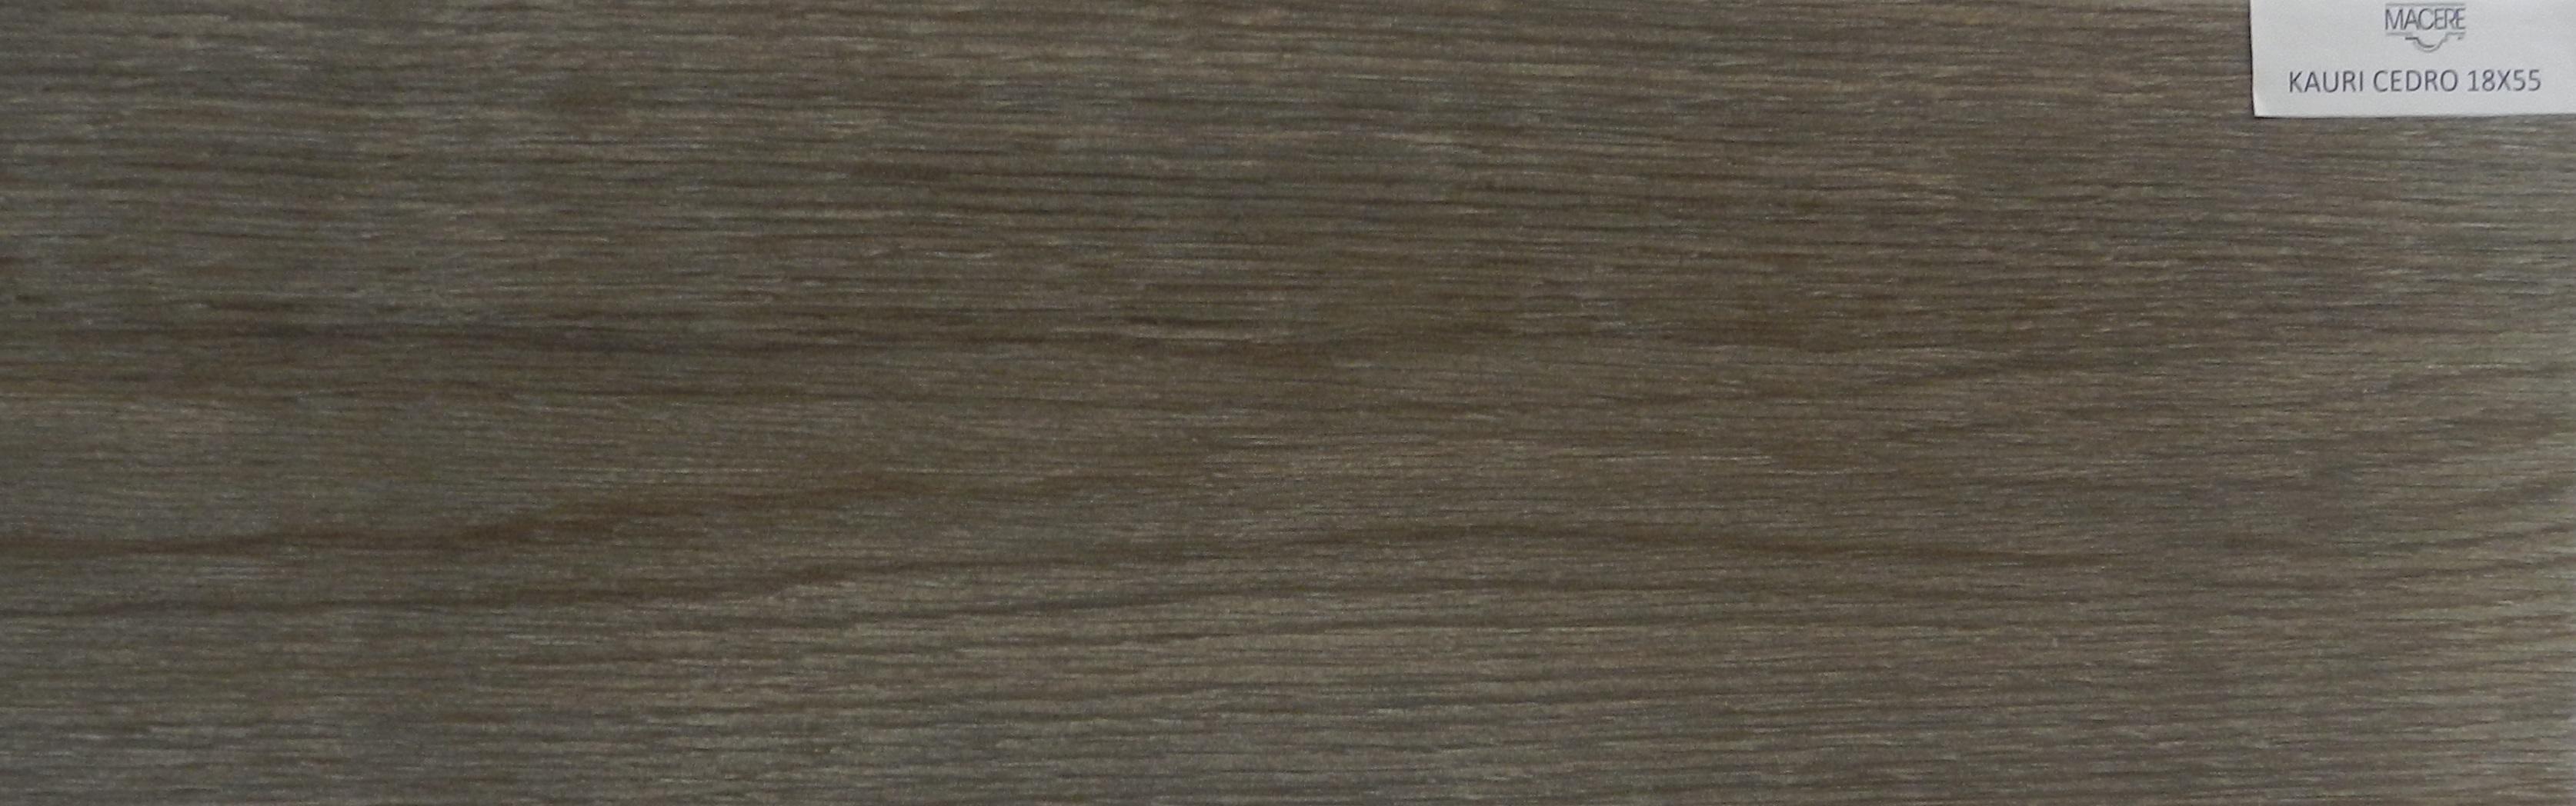 Kauri Cedro 18x55